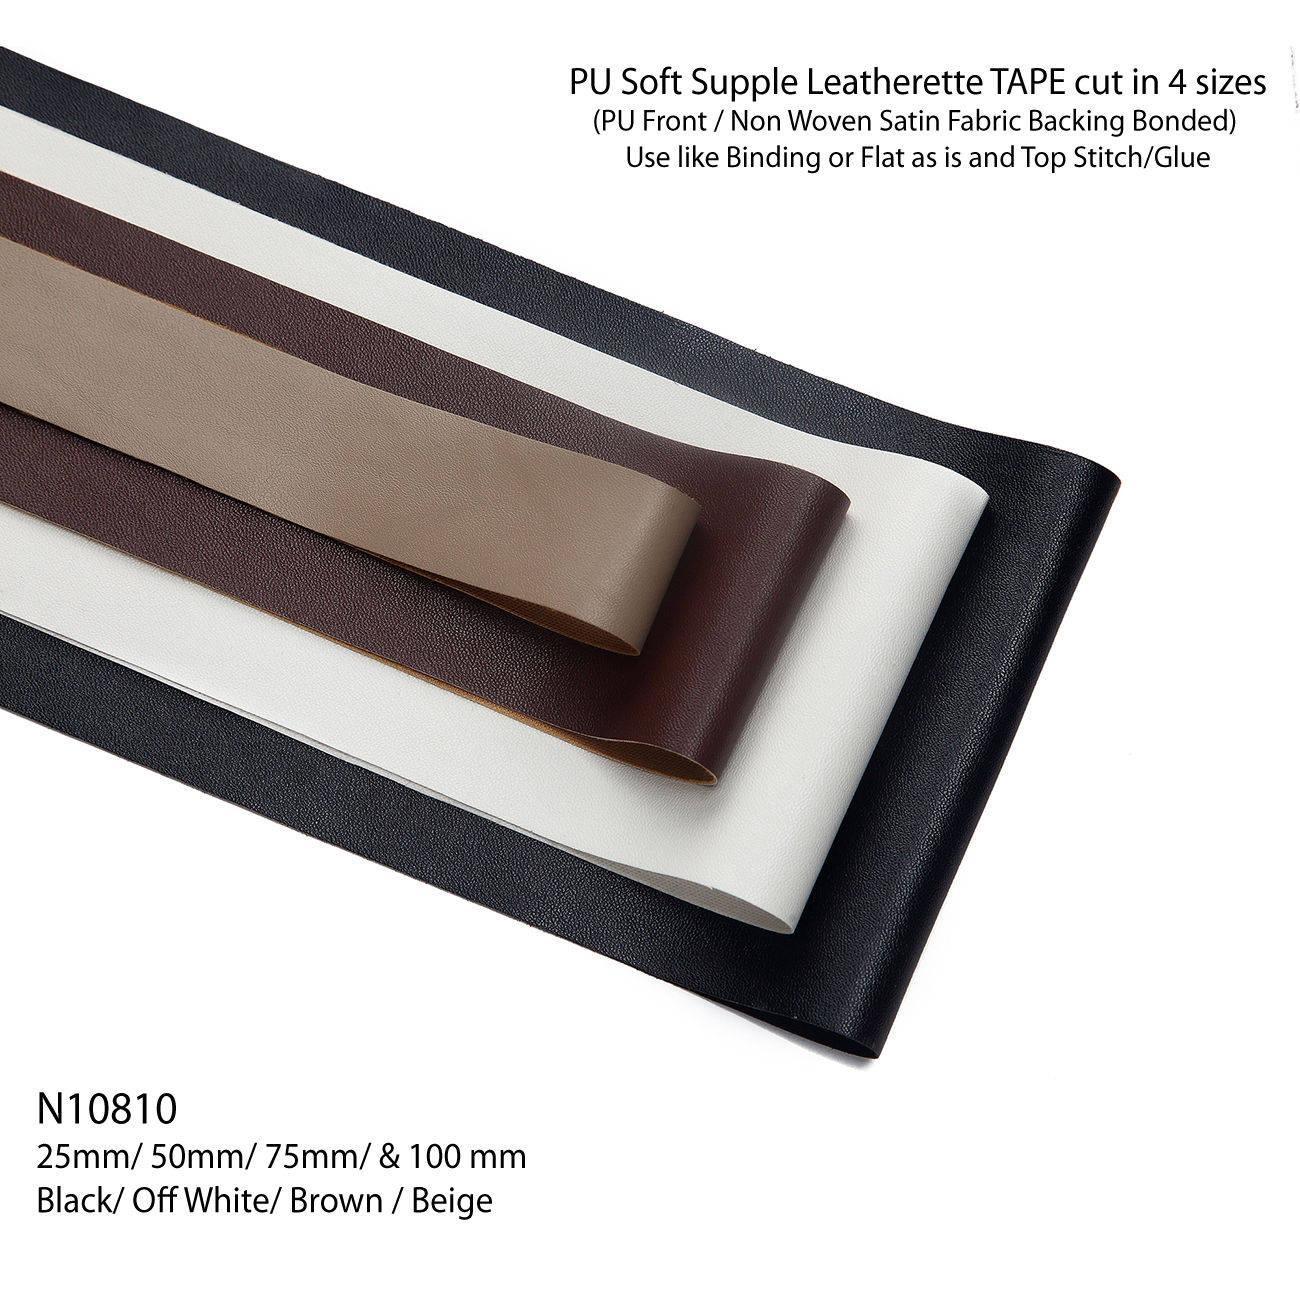 PU Faux Imitation Leather Cut Binding Flat Tape Trimming